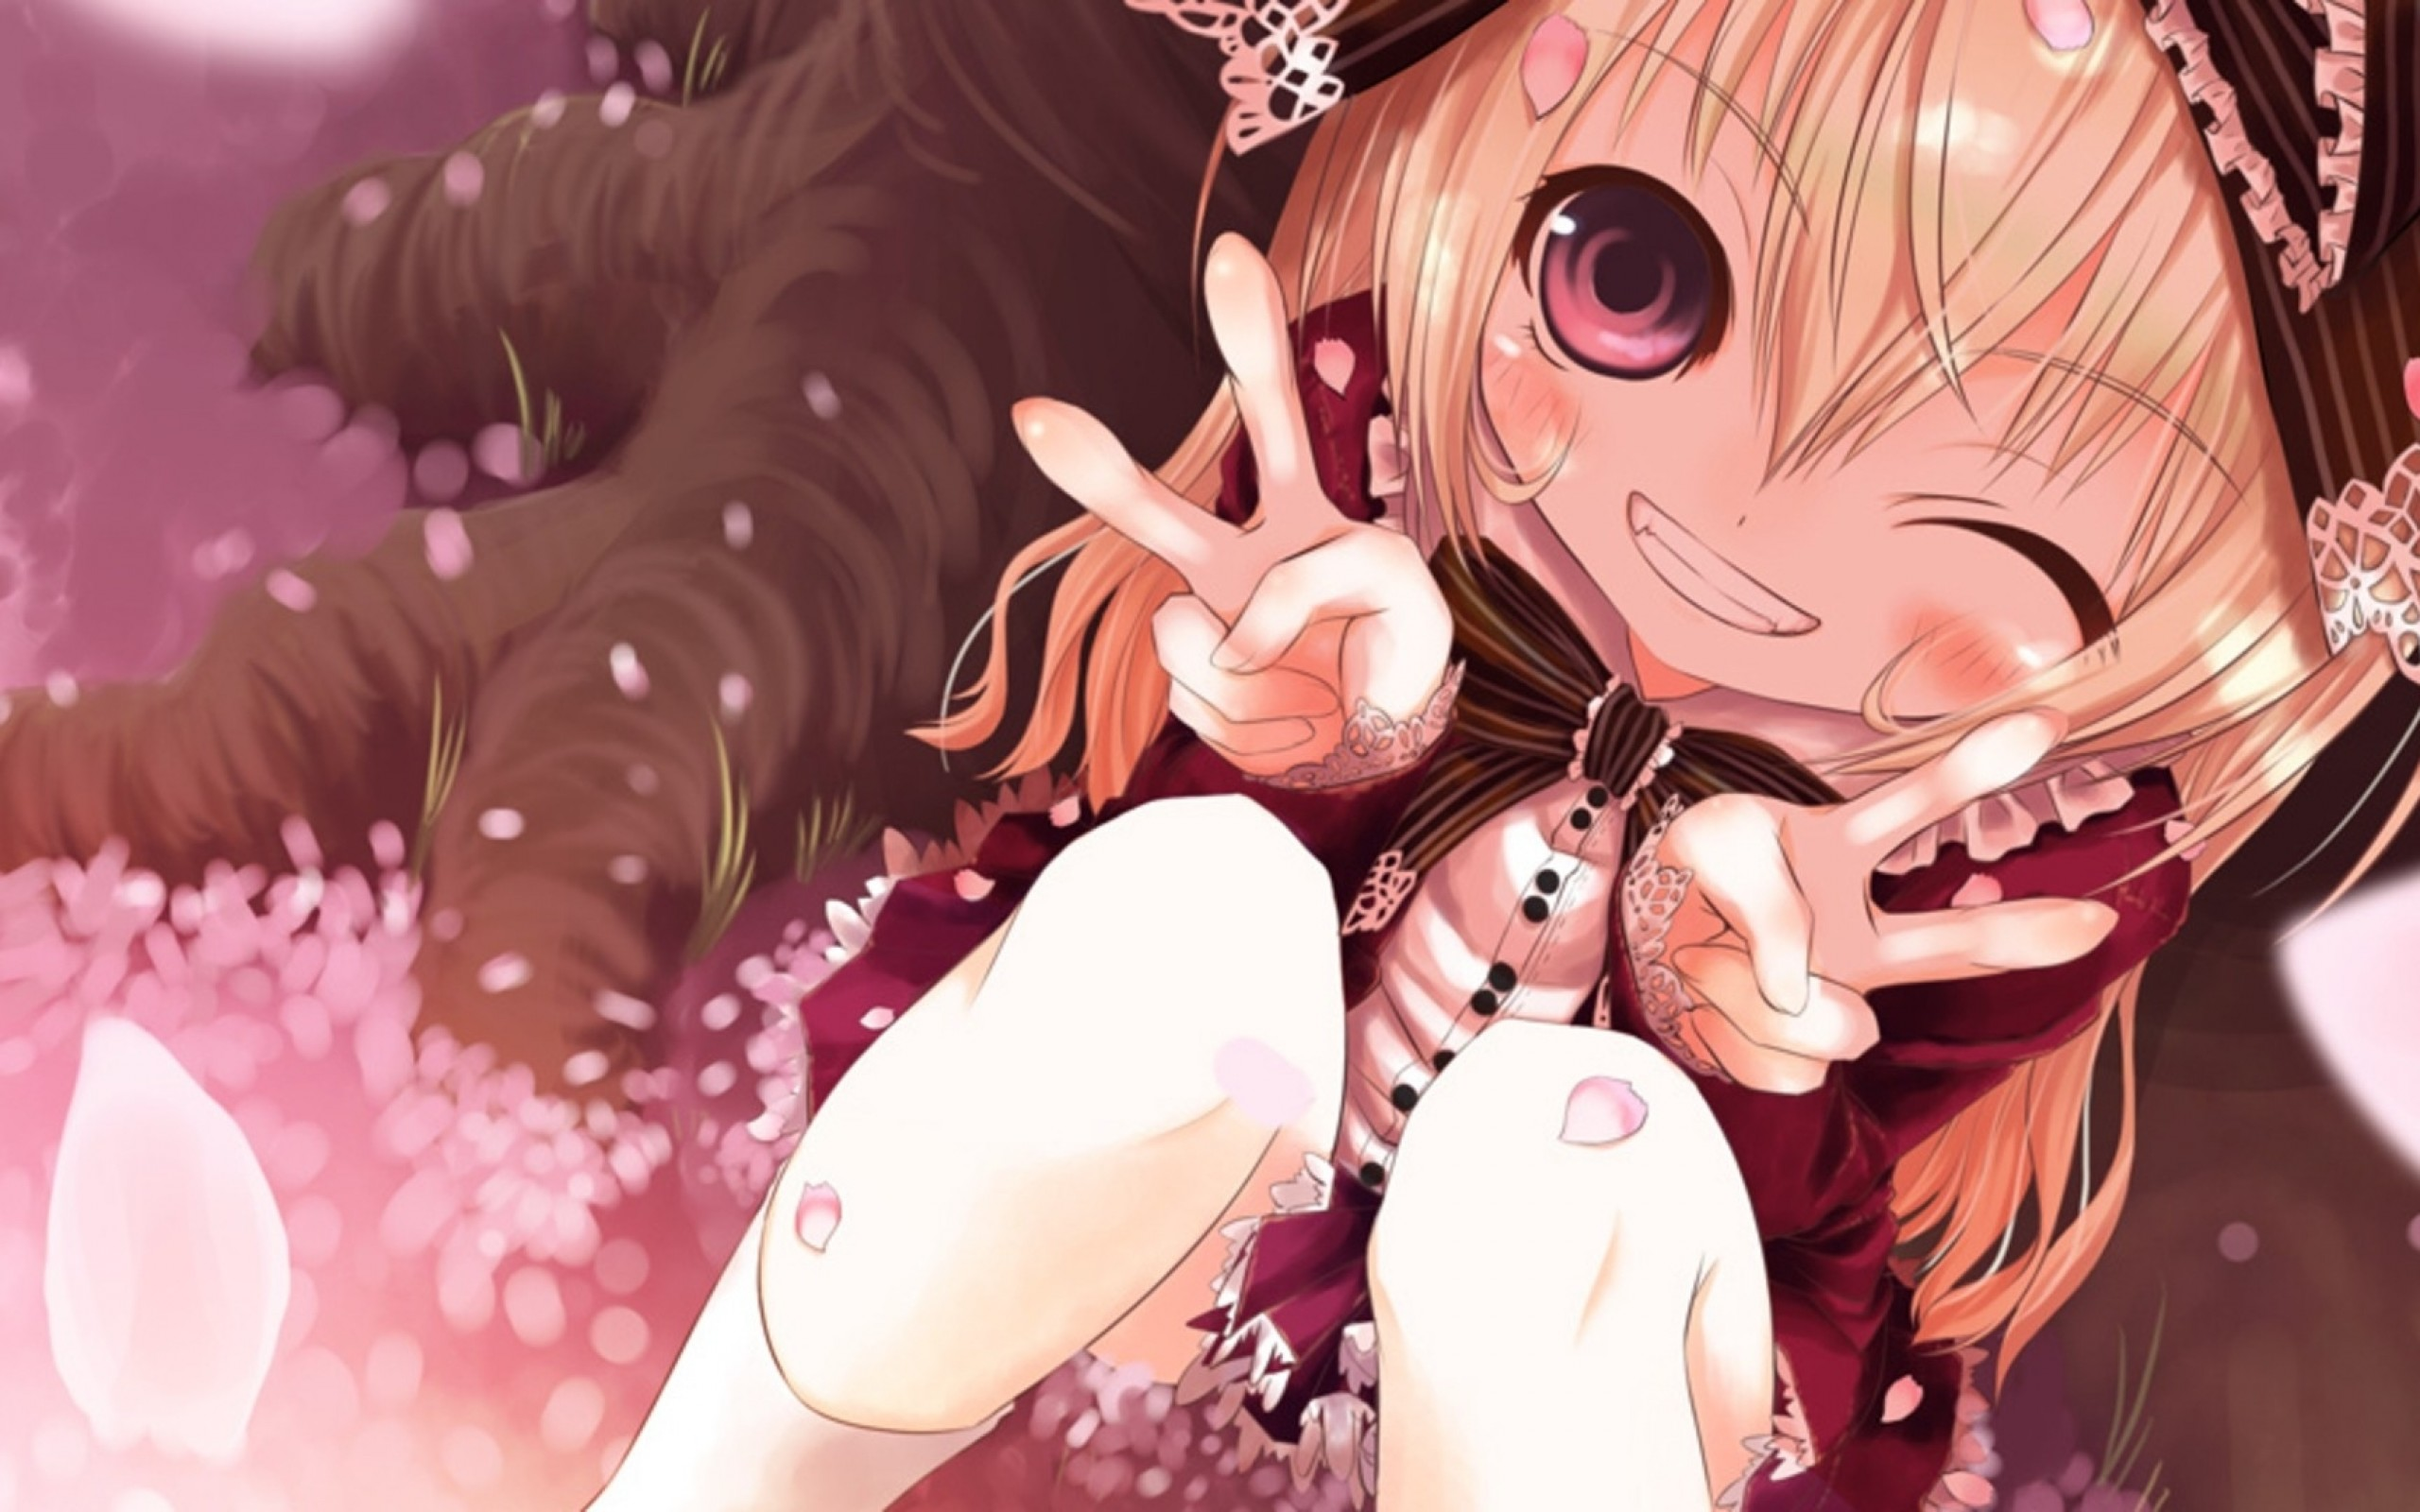 Haid Lbh Dr 15 Hari Tumblr Static Chica Anime Cherry Cinta De Cabeza